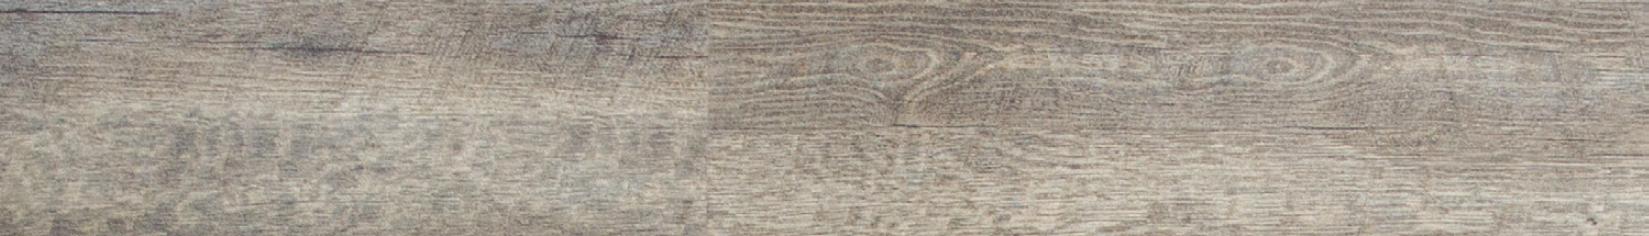 "Proportional Sample 7"" x 48"" Luxe Wildwood LVT"